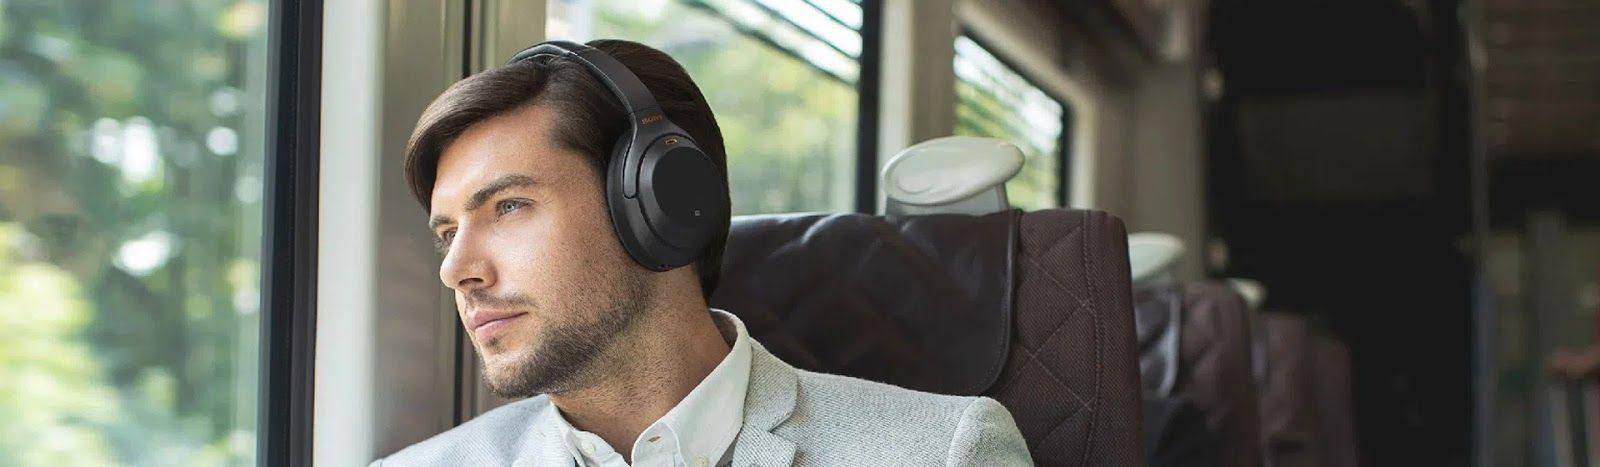 Sony WH-1000XM4 vem aí: teaser indica lançamento próximo no Brasil